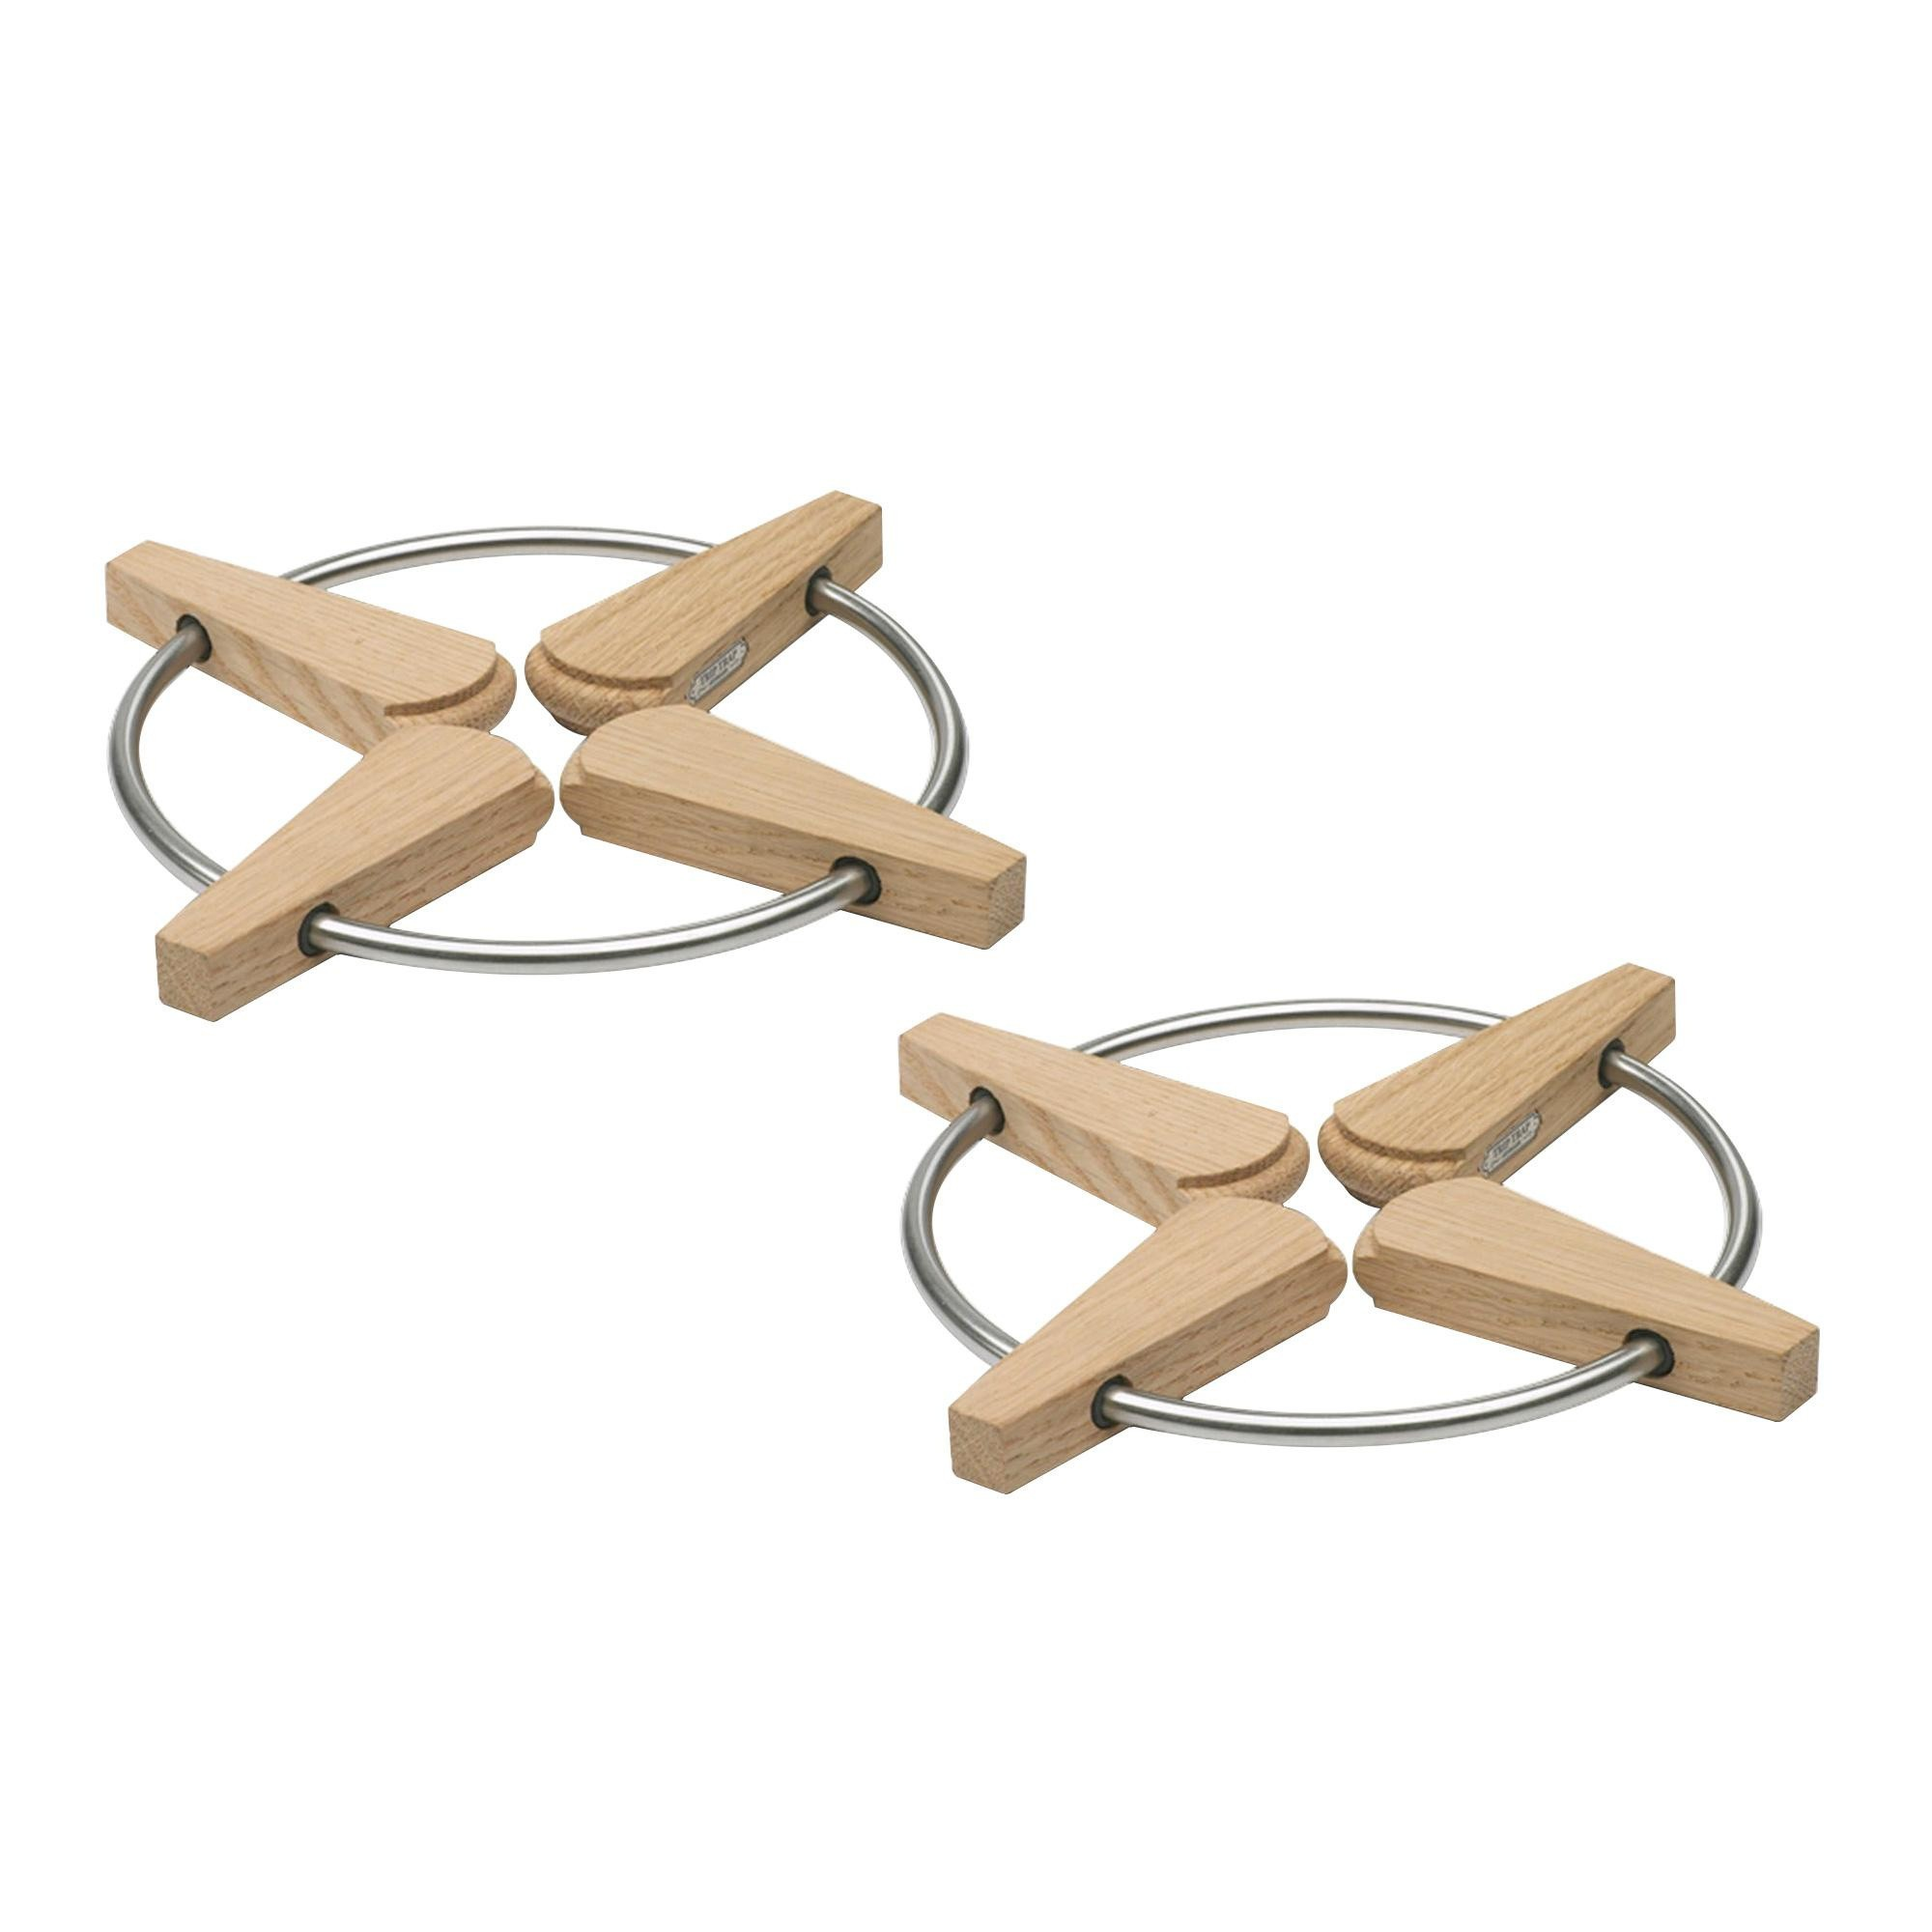 Wondrous Folding Trivet Set Of 2 Creativecarmelina Interior Chair Design Creativecarmelinacom